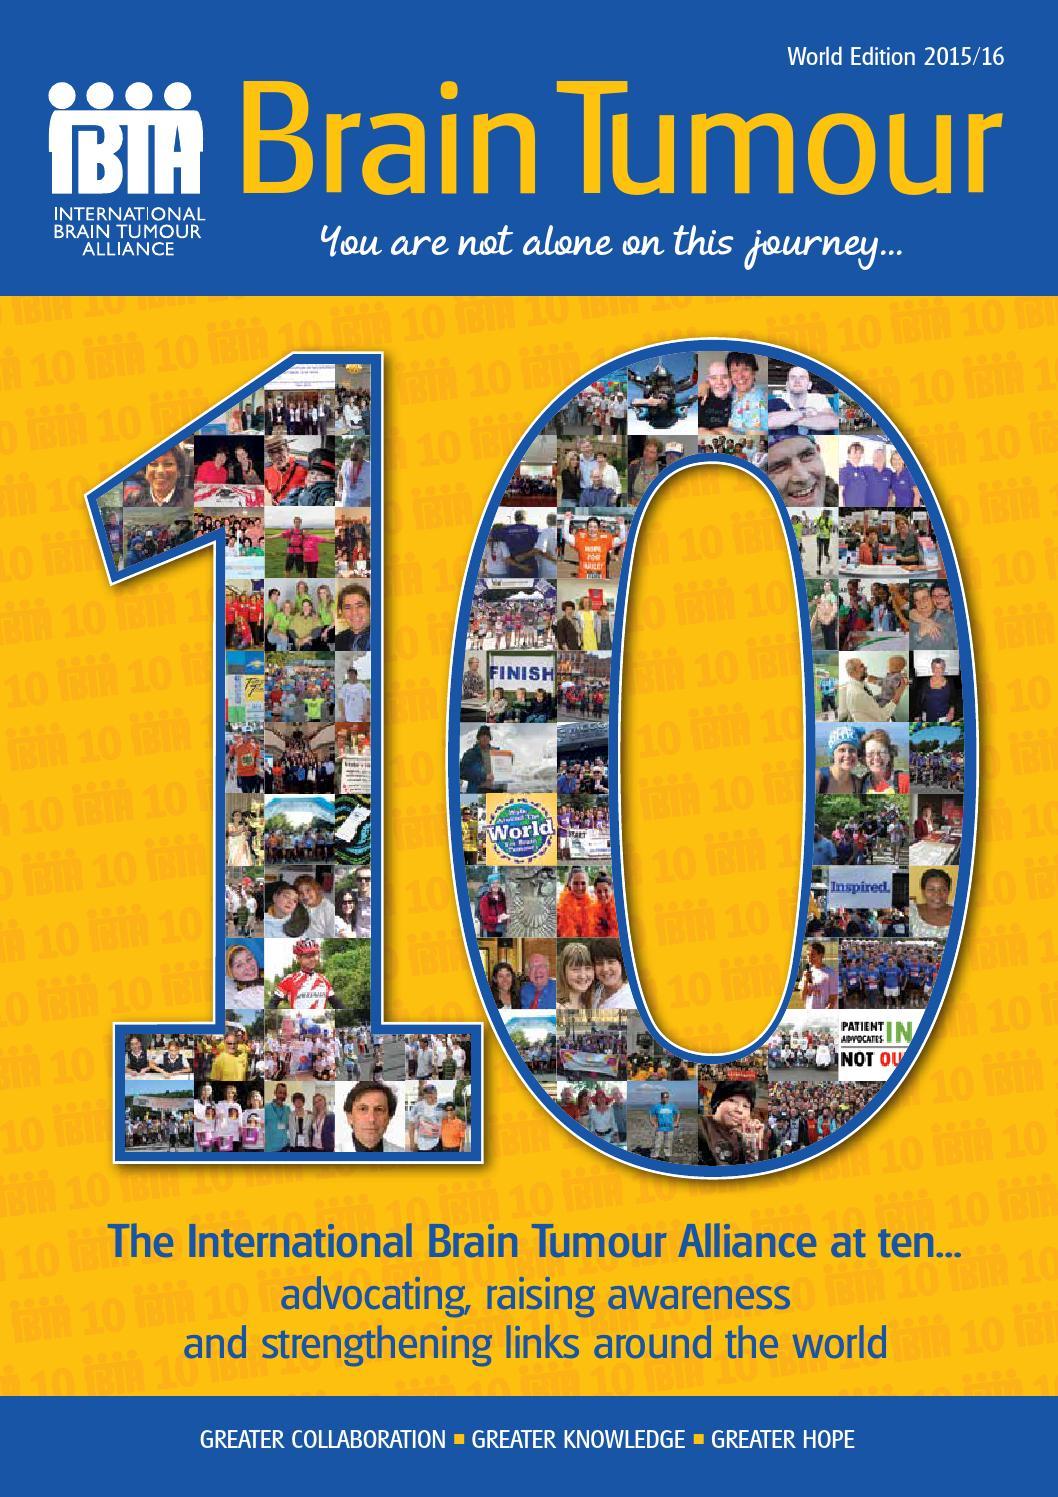 Brain Tumour Magazine: World Edition 2015 by The International Brain Tumour  Alliance (IBTA) - issuu